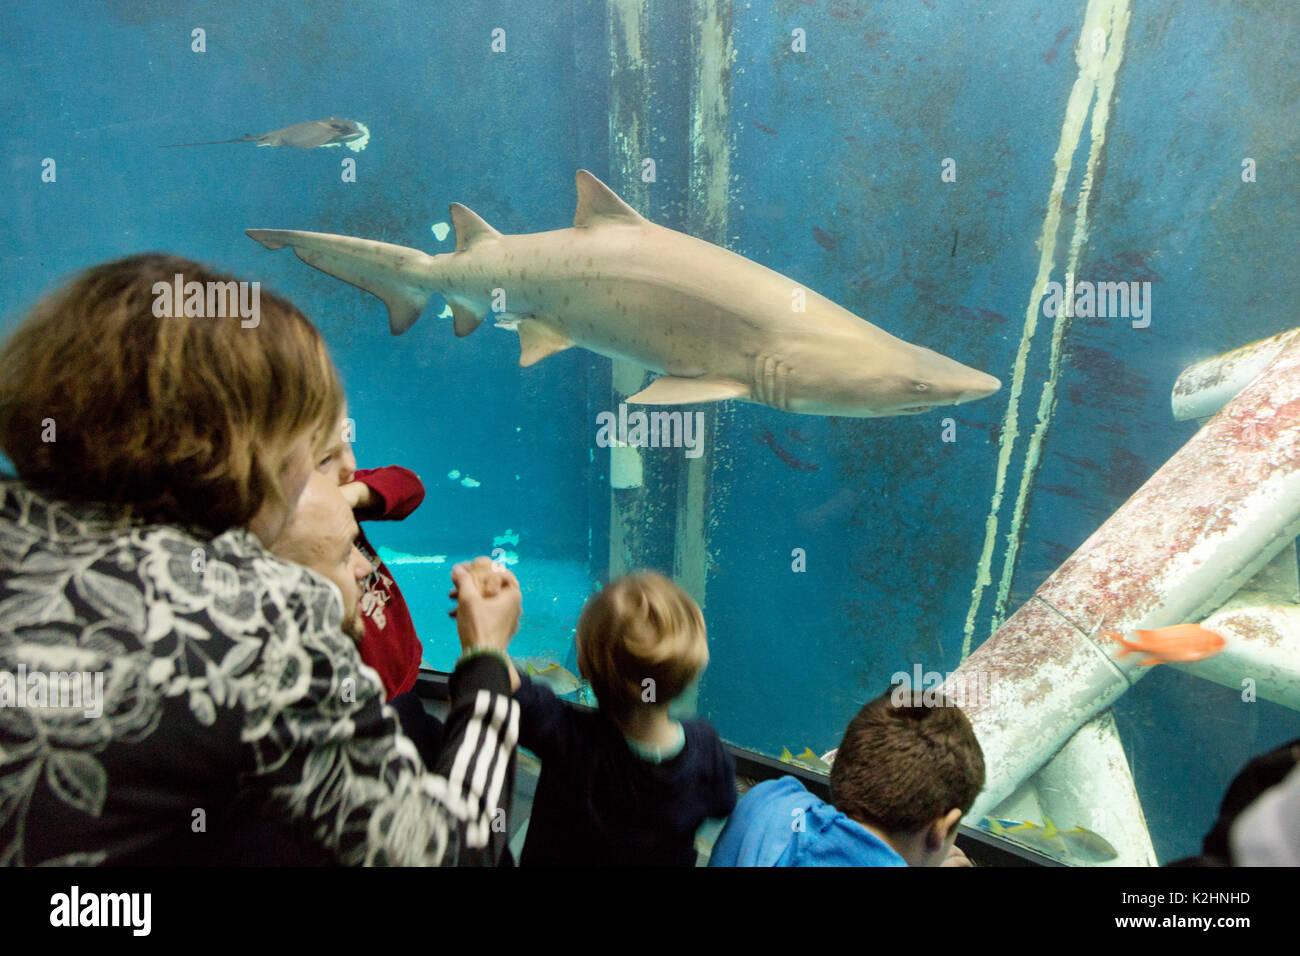 St Malo aquarium - tourists looking at a shark, Great Aquarium Saint Malo ,  Brittany France - Stock Image